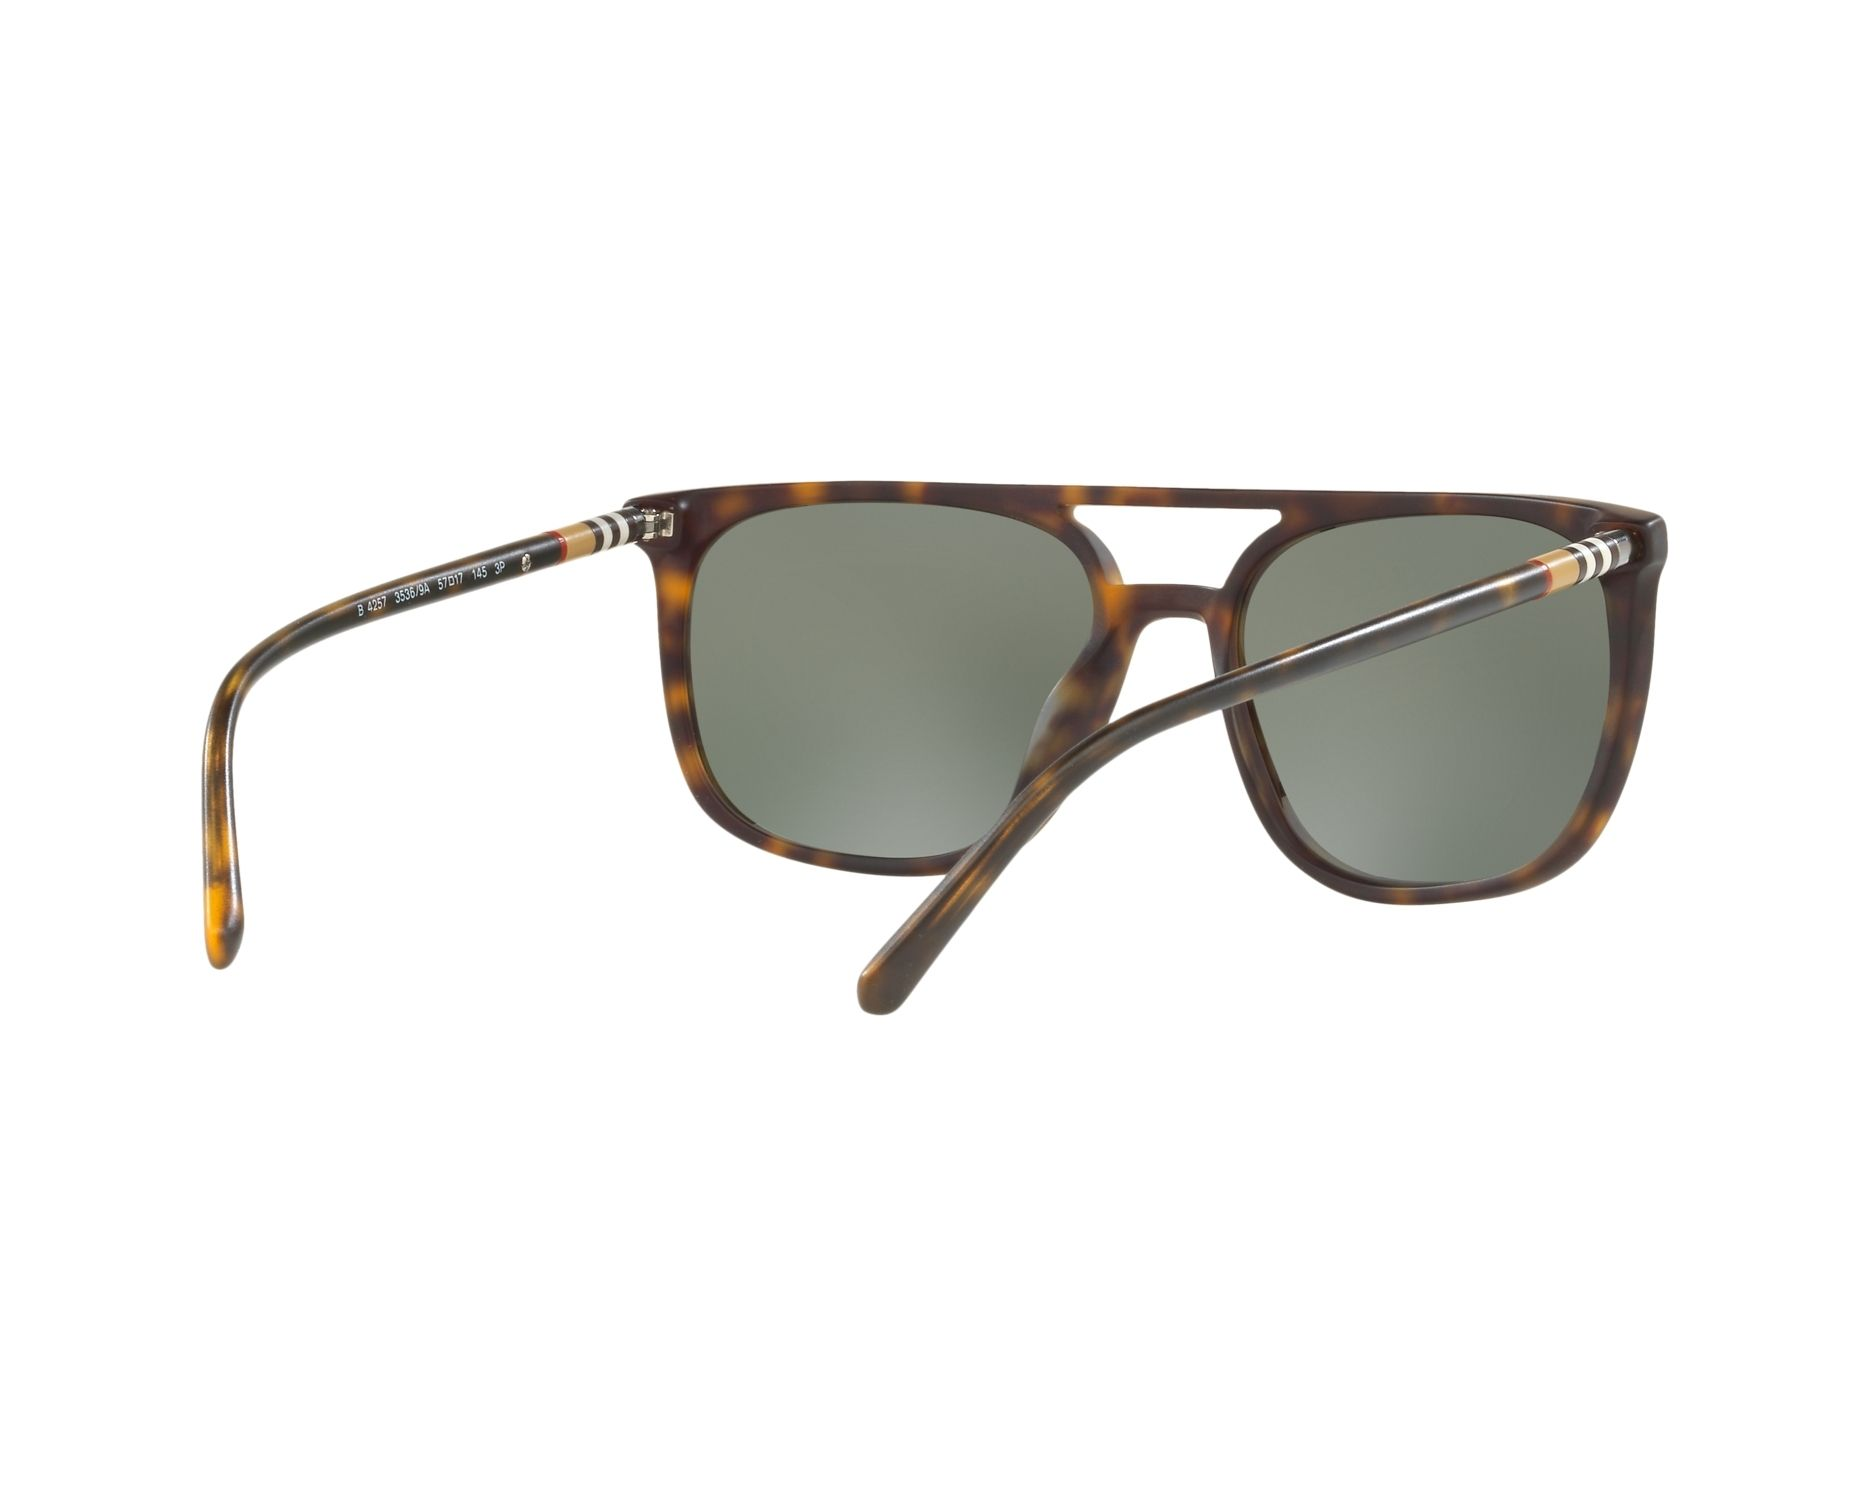 a9e5cf6c4db Sunglasses Burberry BE-4257 35369A 57-17 Havana 360 degree view 8